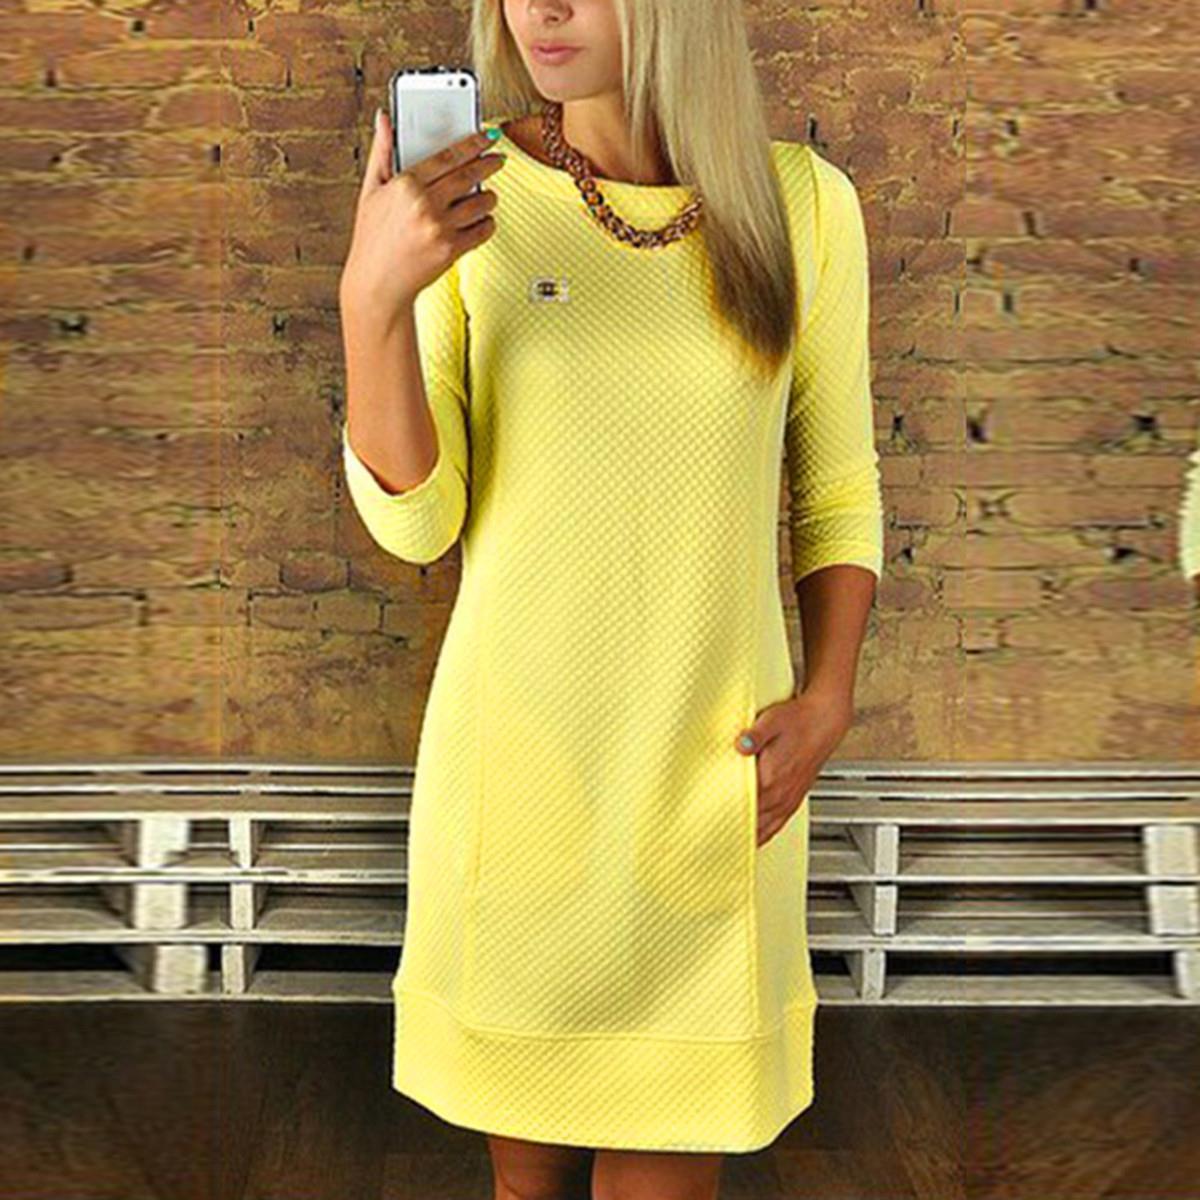 b926e22ce46c52 Hot Sale 2016 Frauen A-Linie Kleid-Damen Herbst-Winter-beiläufige feste